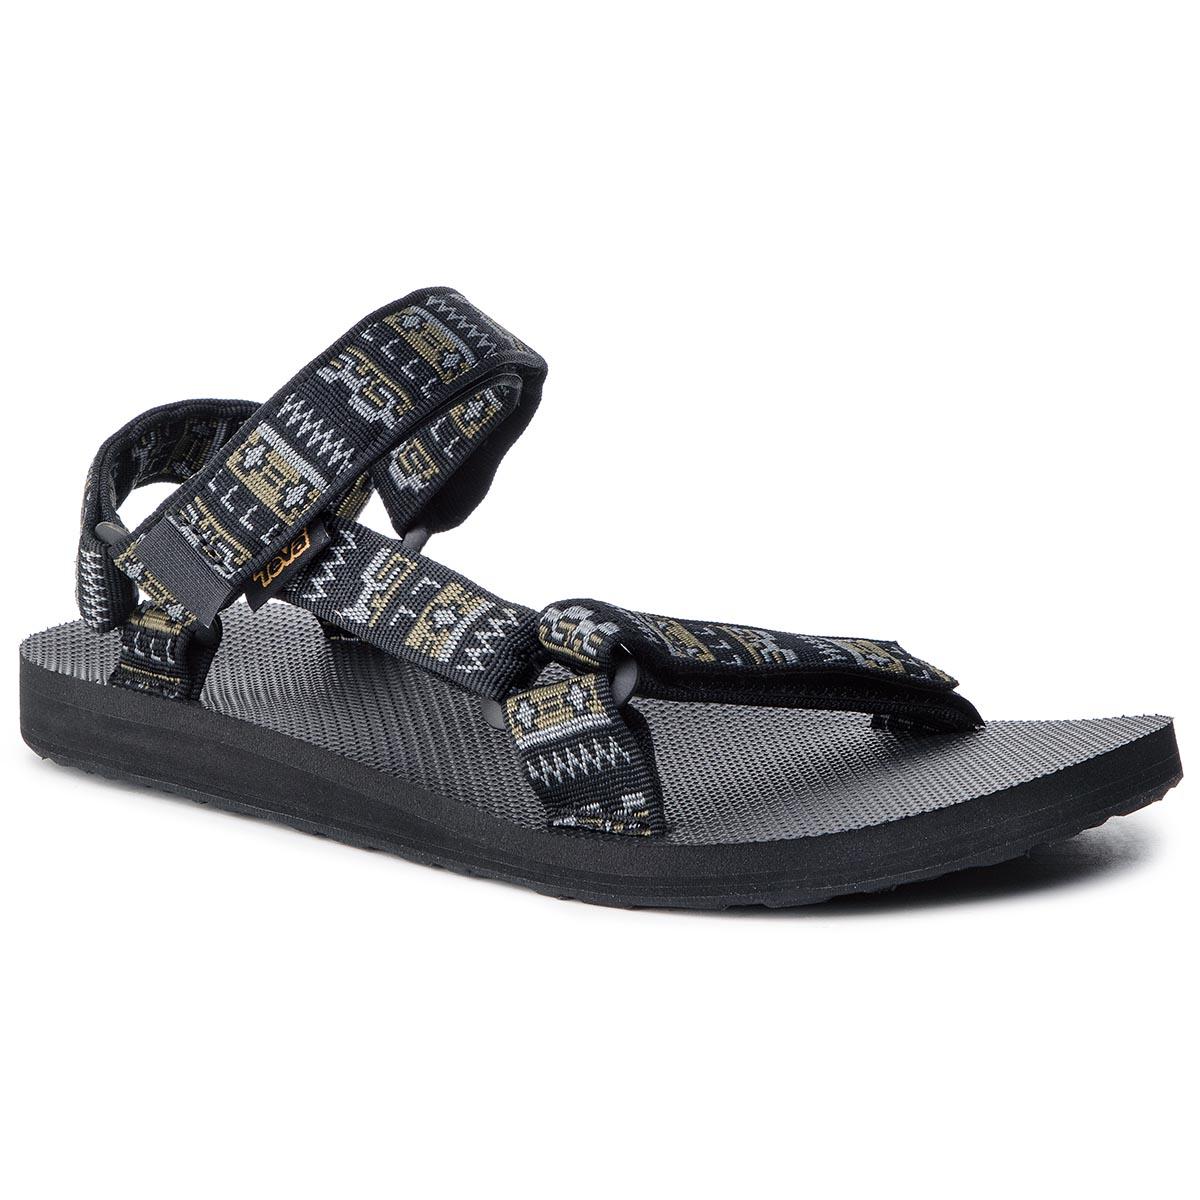 2b28be3d Sandals TEVA - Original Universal 1004006 Boomerang Black/White ...